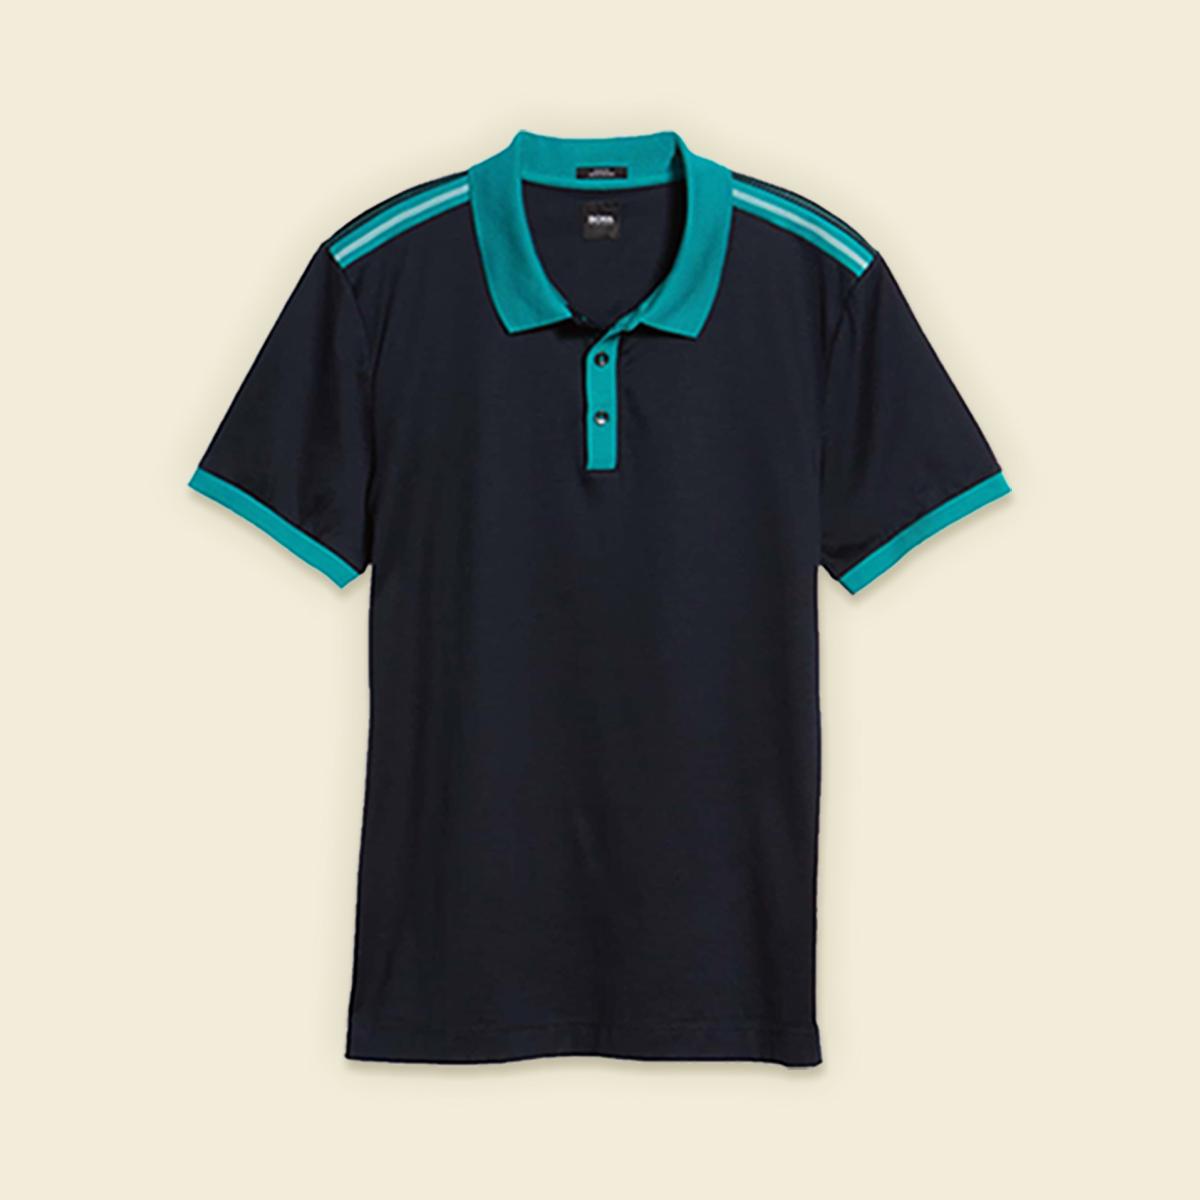 Black polo shirt with teal collar.